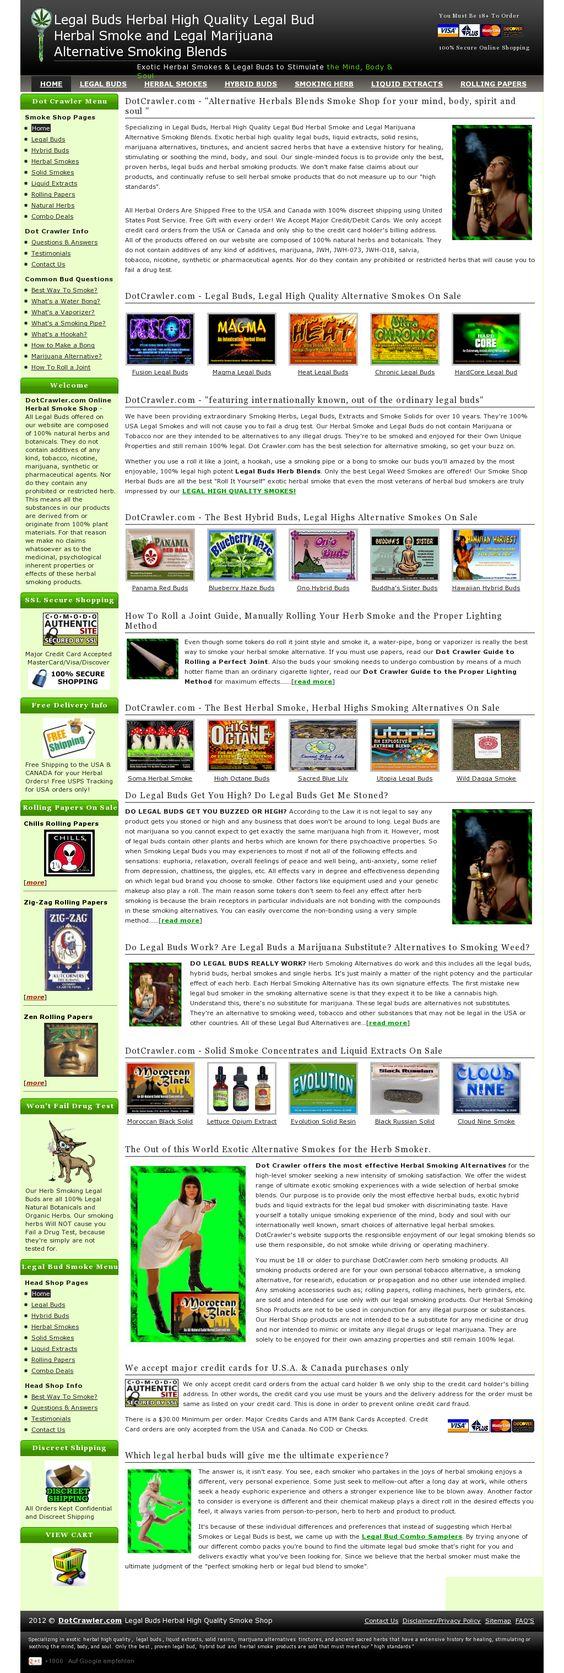 Buy herbal highs - Herbal Incense Blends For Herbal Potpourri Incense Like Kush Dabomb Voodoo Barely Legal At Our Online Herbal Incense Shop Buy Herbal Incense Potpo